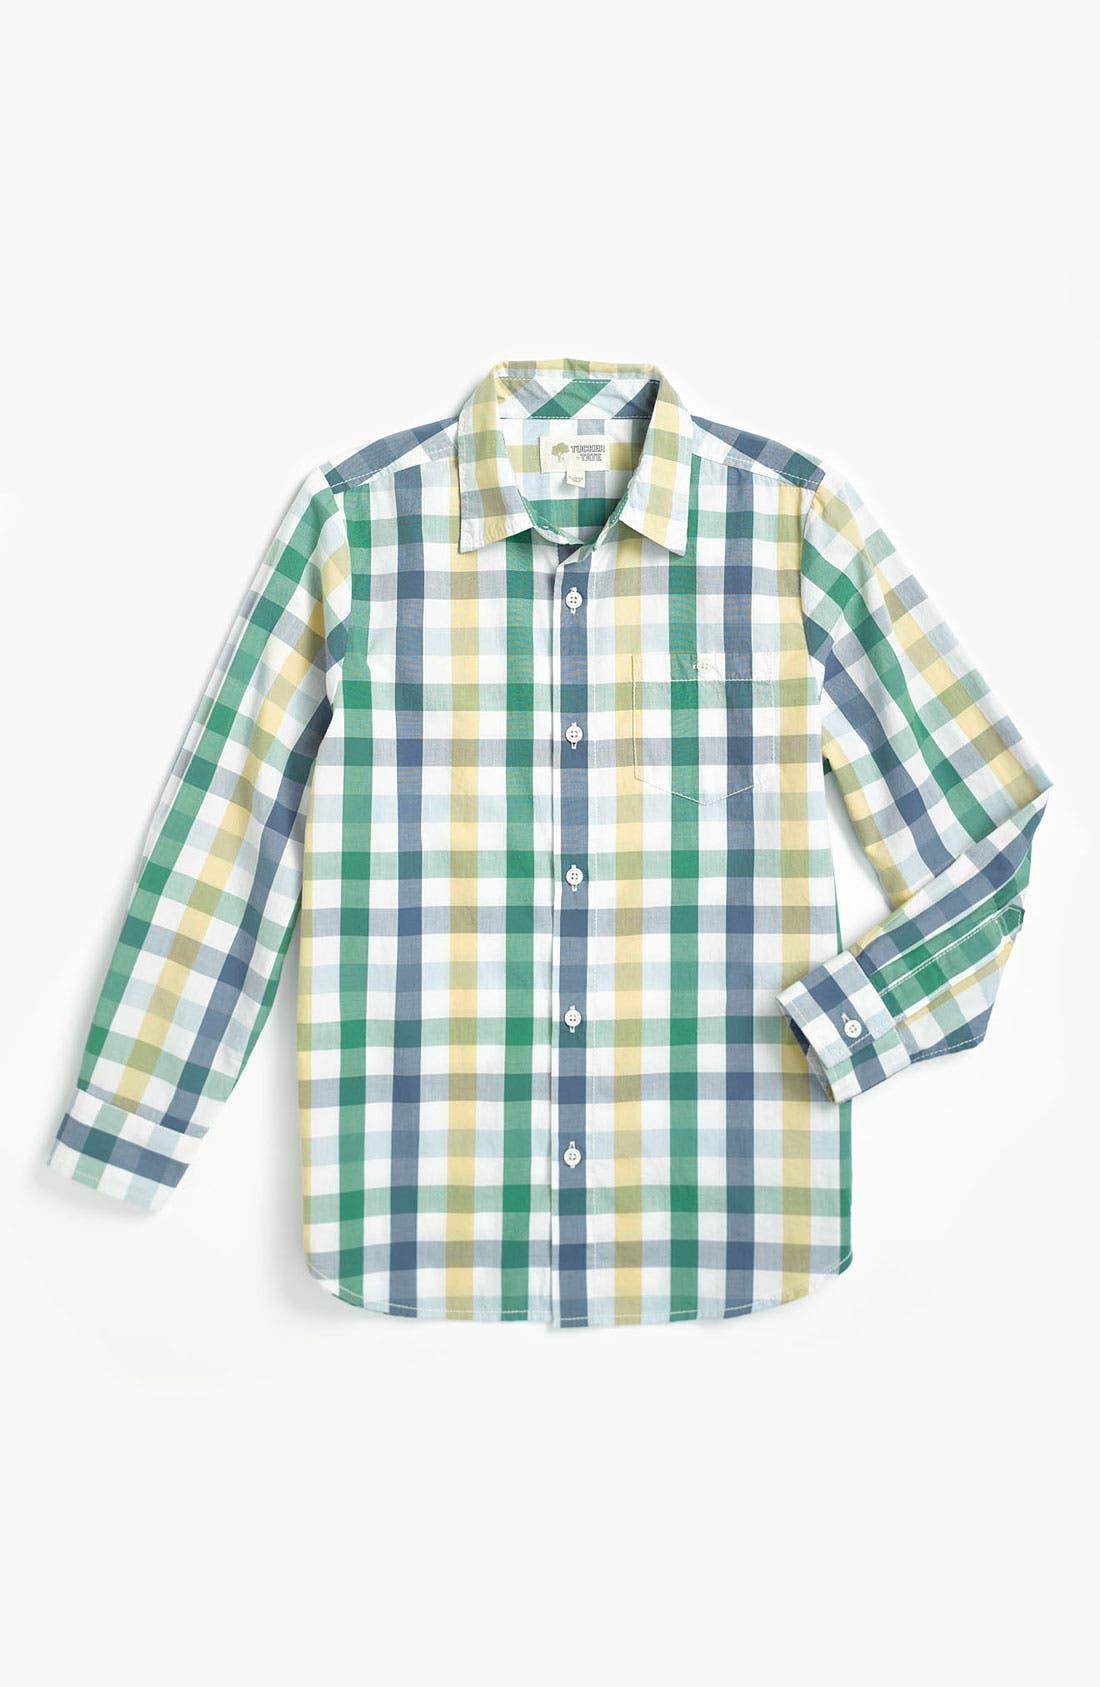 Alternate Image 1 Selected - Tucker + Tate 'Allister' Poplin Shirt (Big Boys)